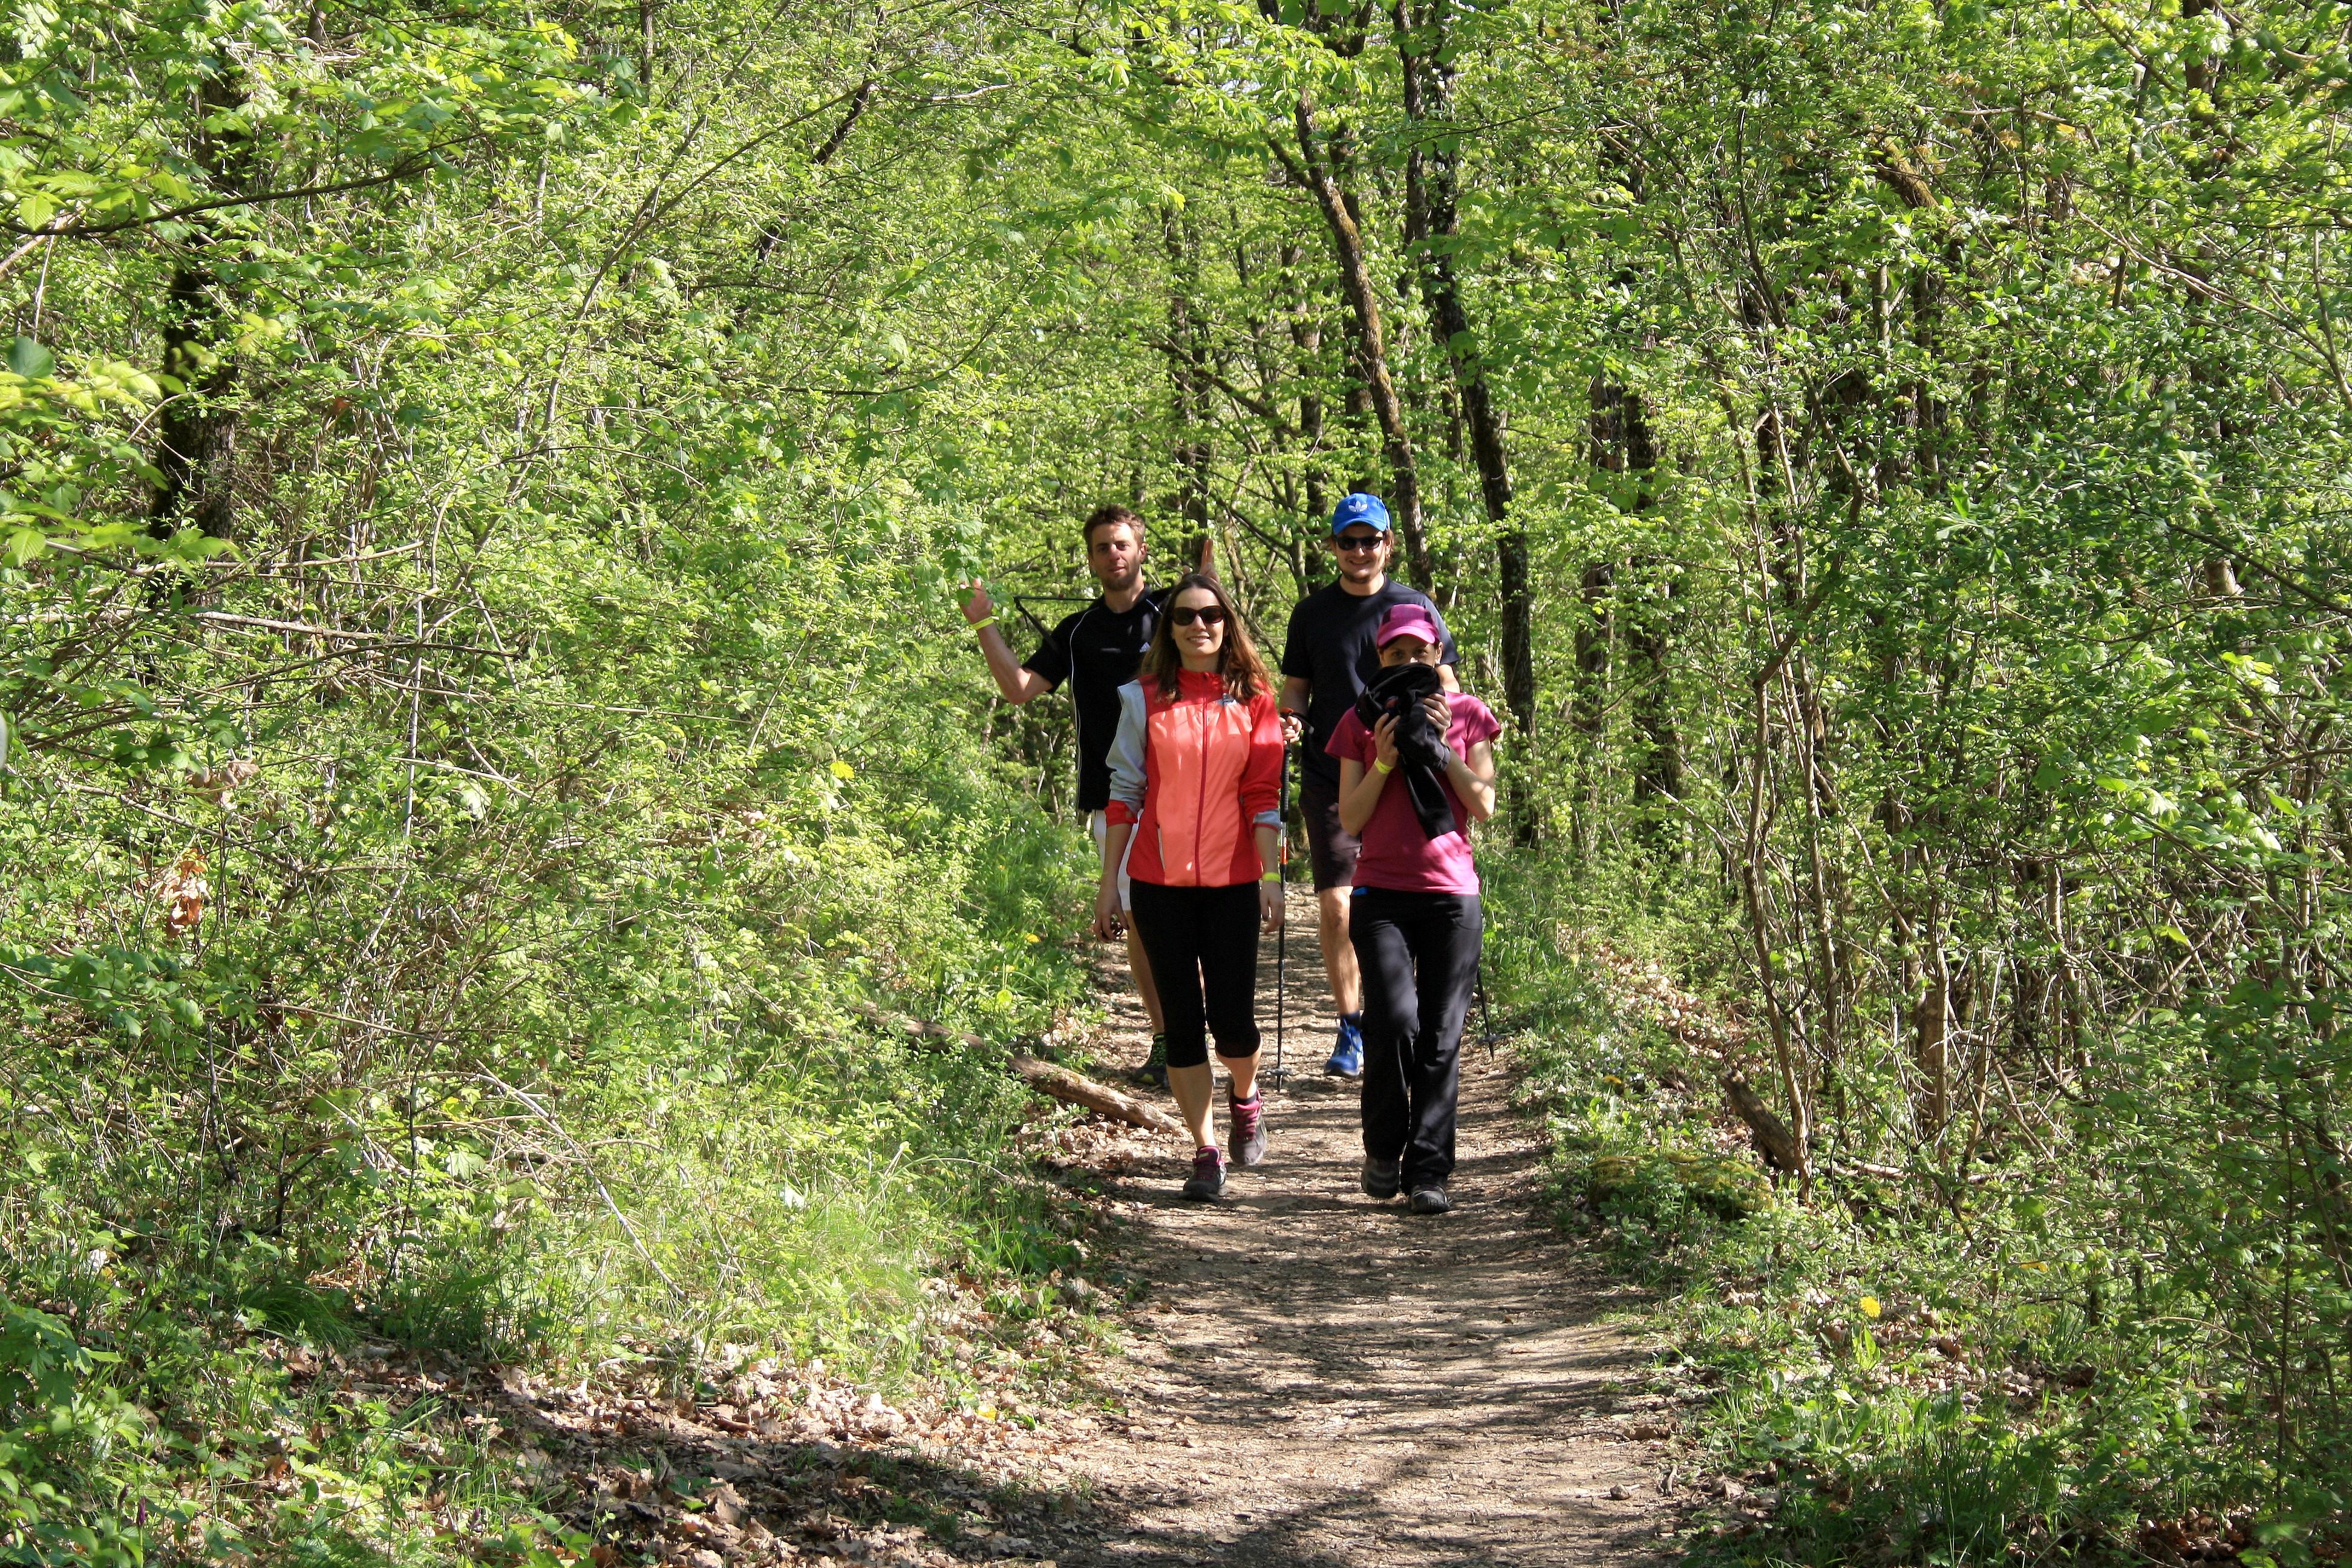 2017-04-09 - Trail-Montfaucon (243) - Copie